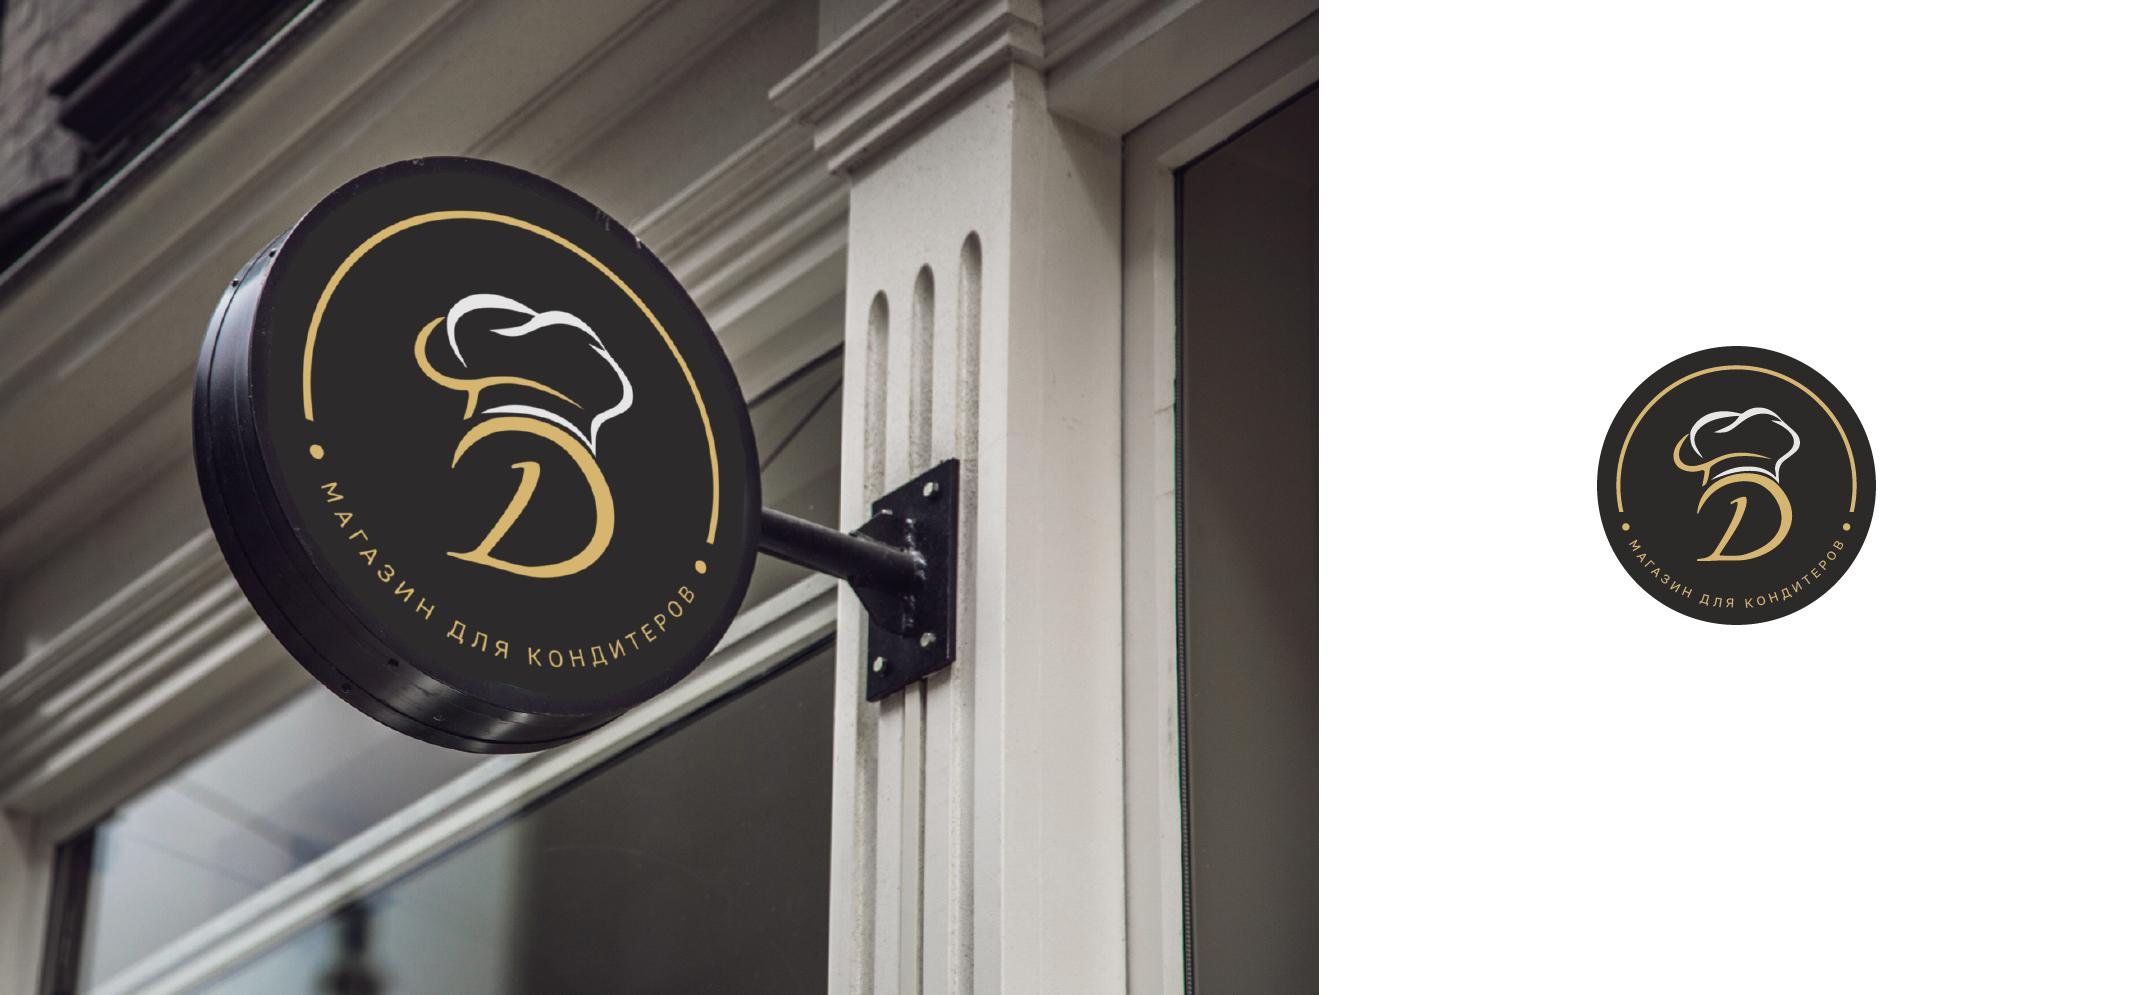 Логотип для магазина для кондитеров фото f_1765f2048766705f.png